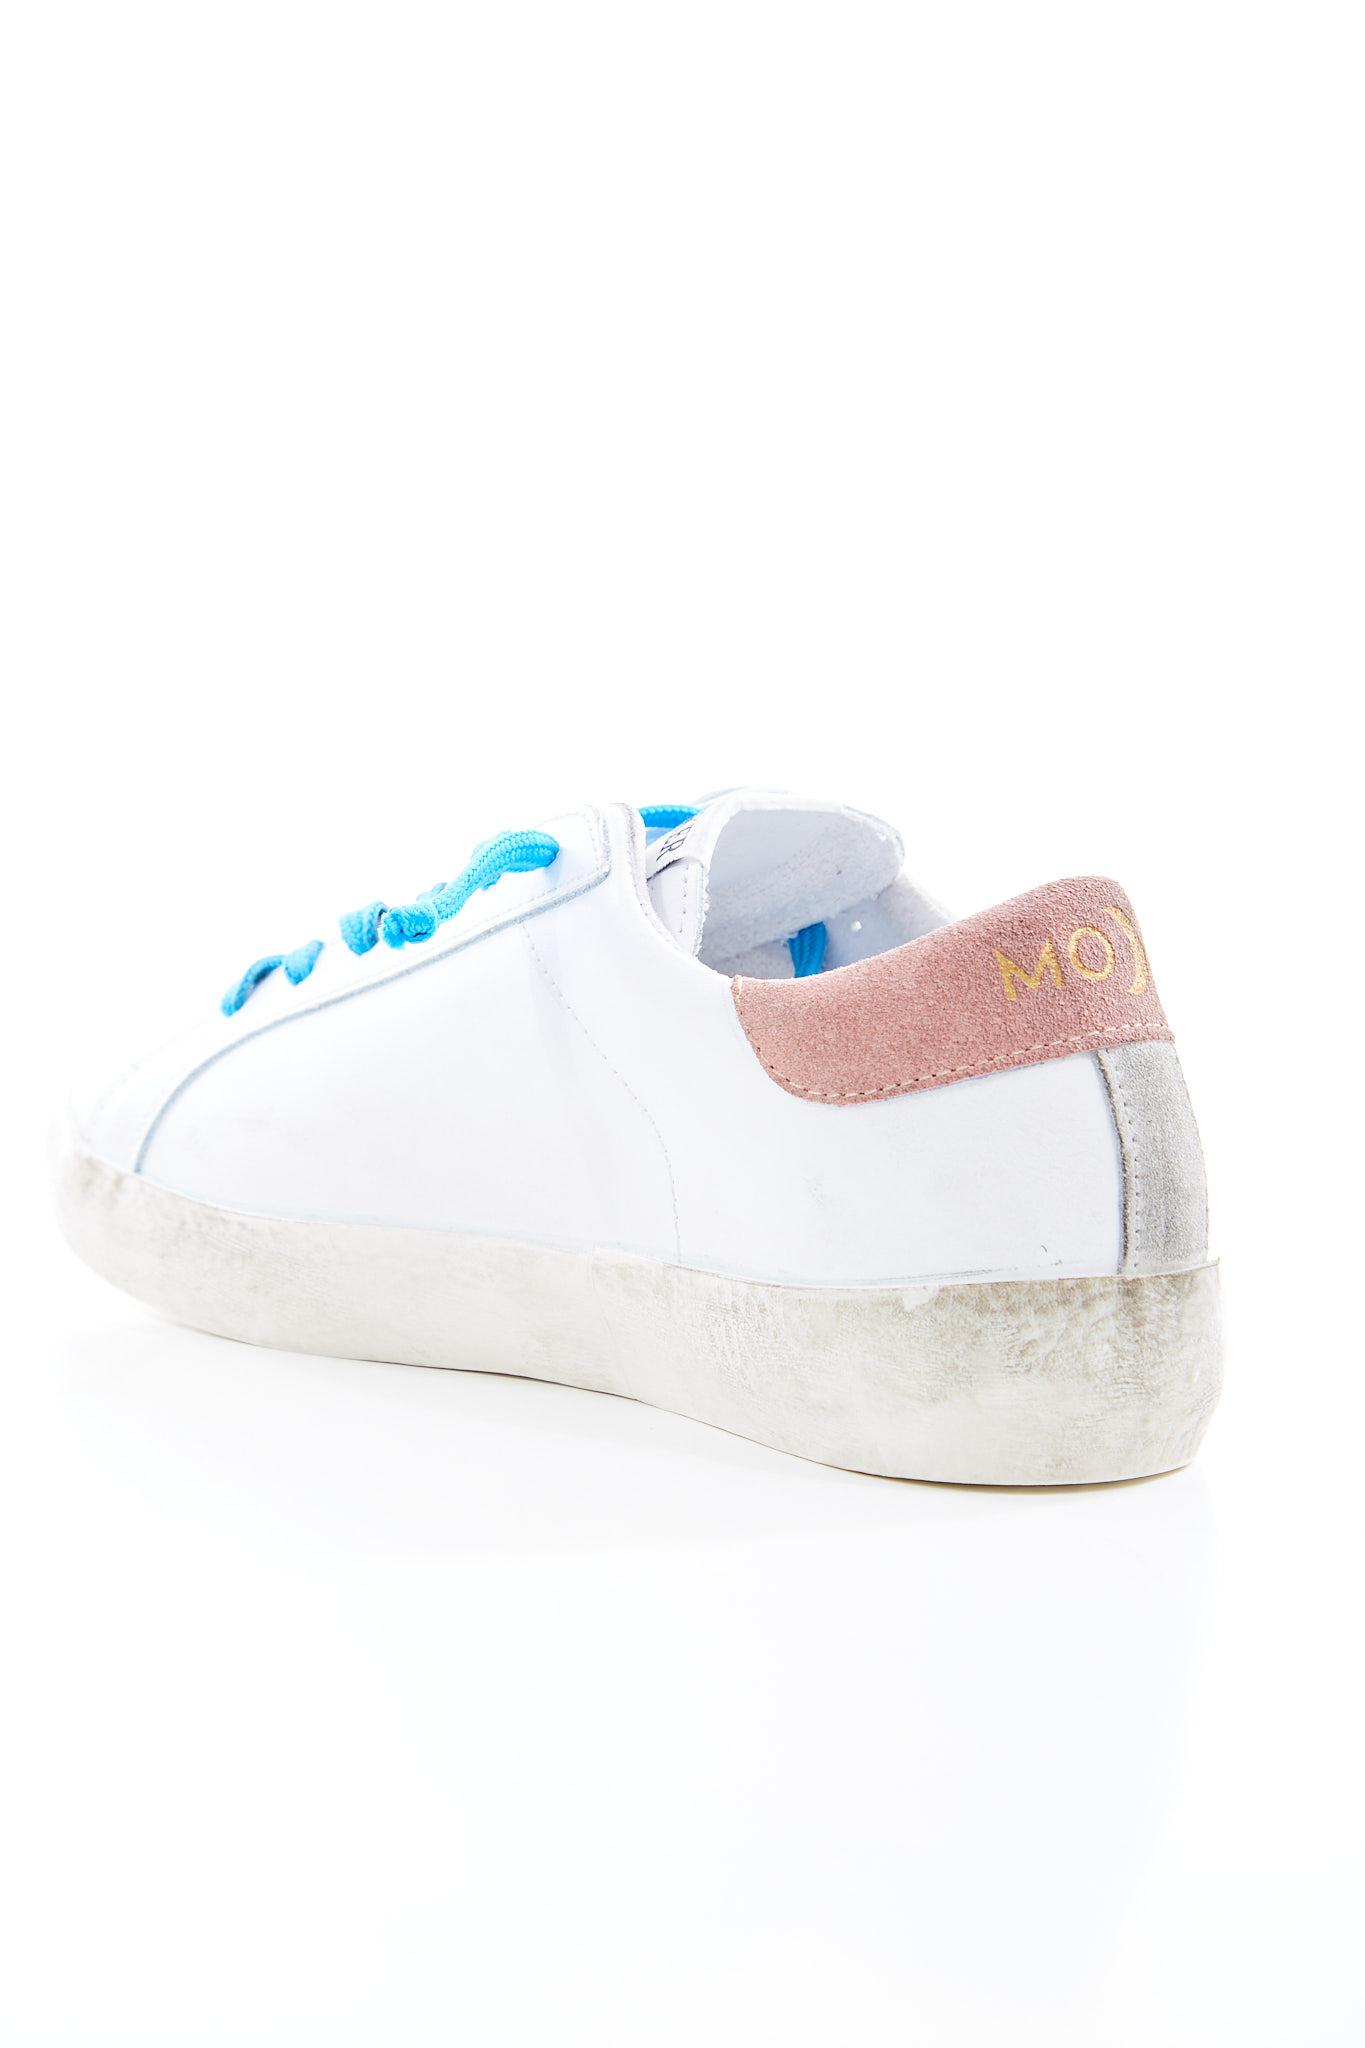 Sneakers basse in pelle UMA PARKER | Scarpe | SUPER MOONBIANCO/ROSA